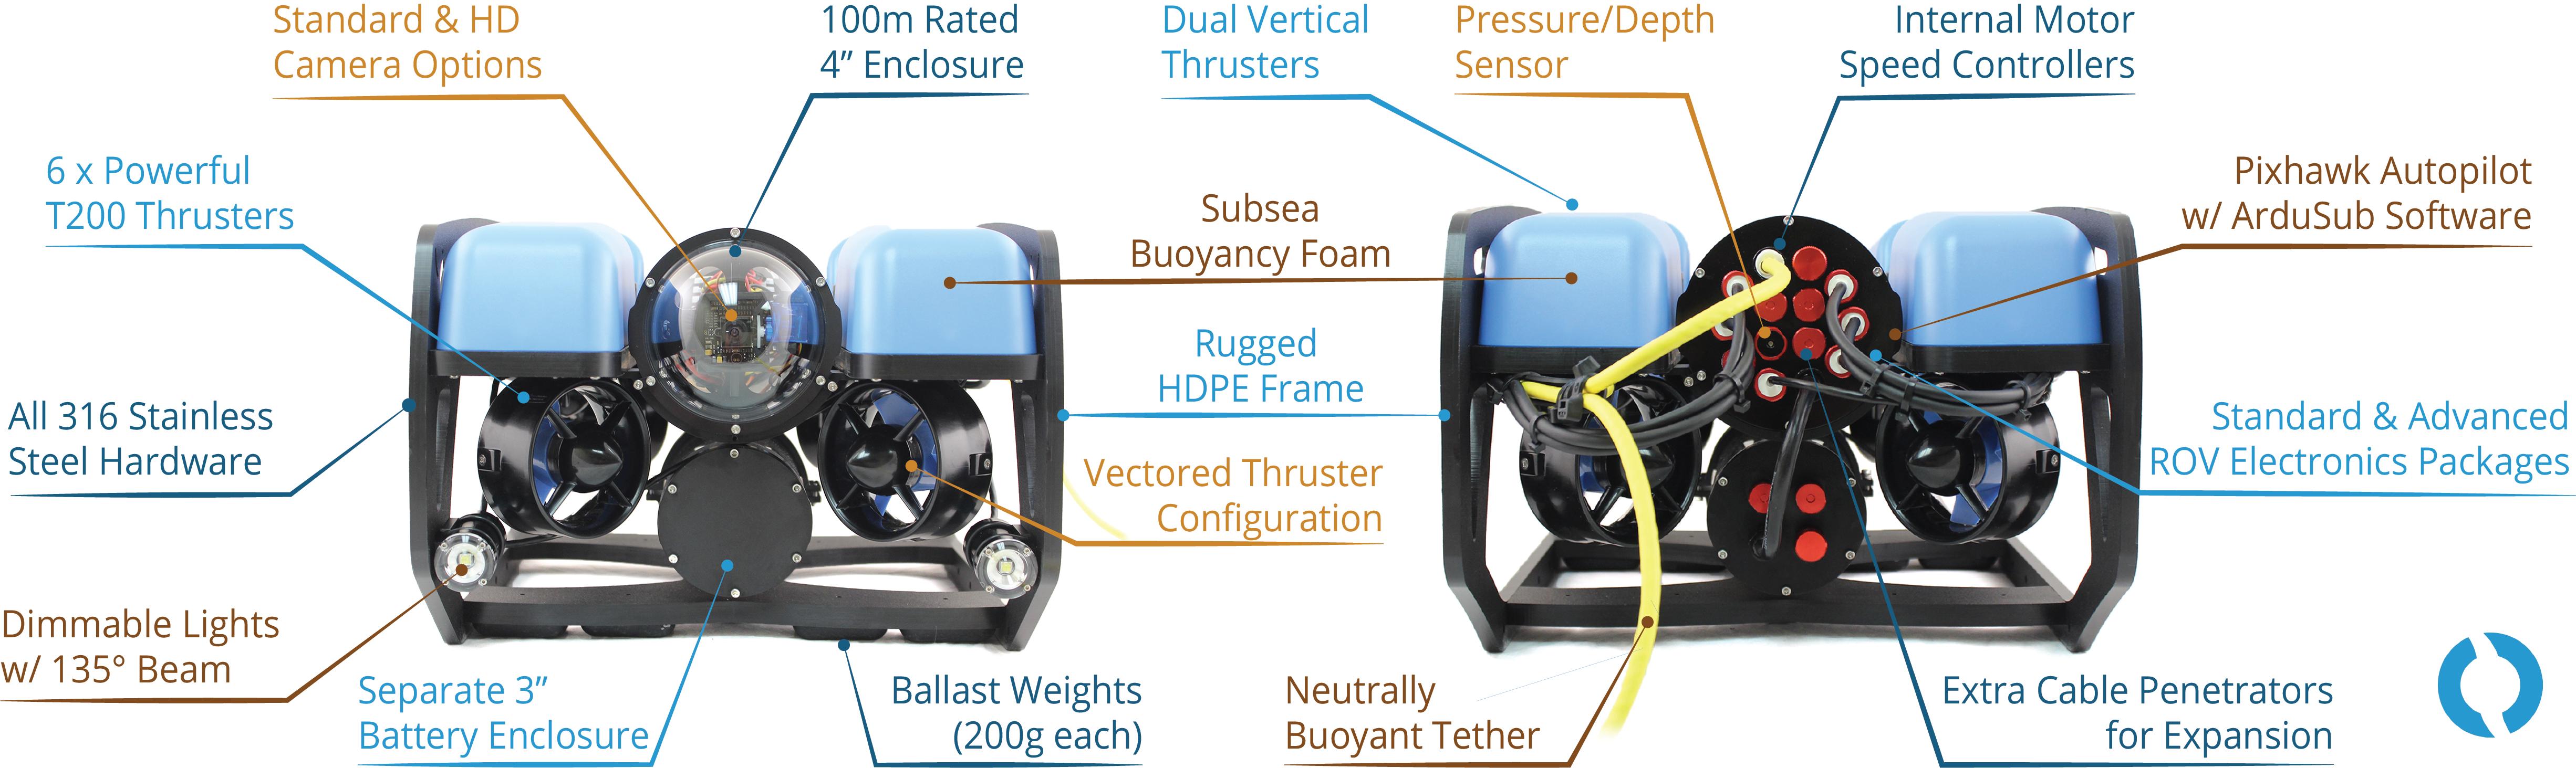 BlueROV2 Features